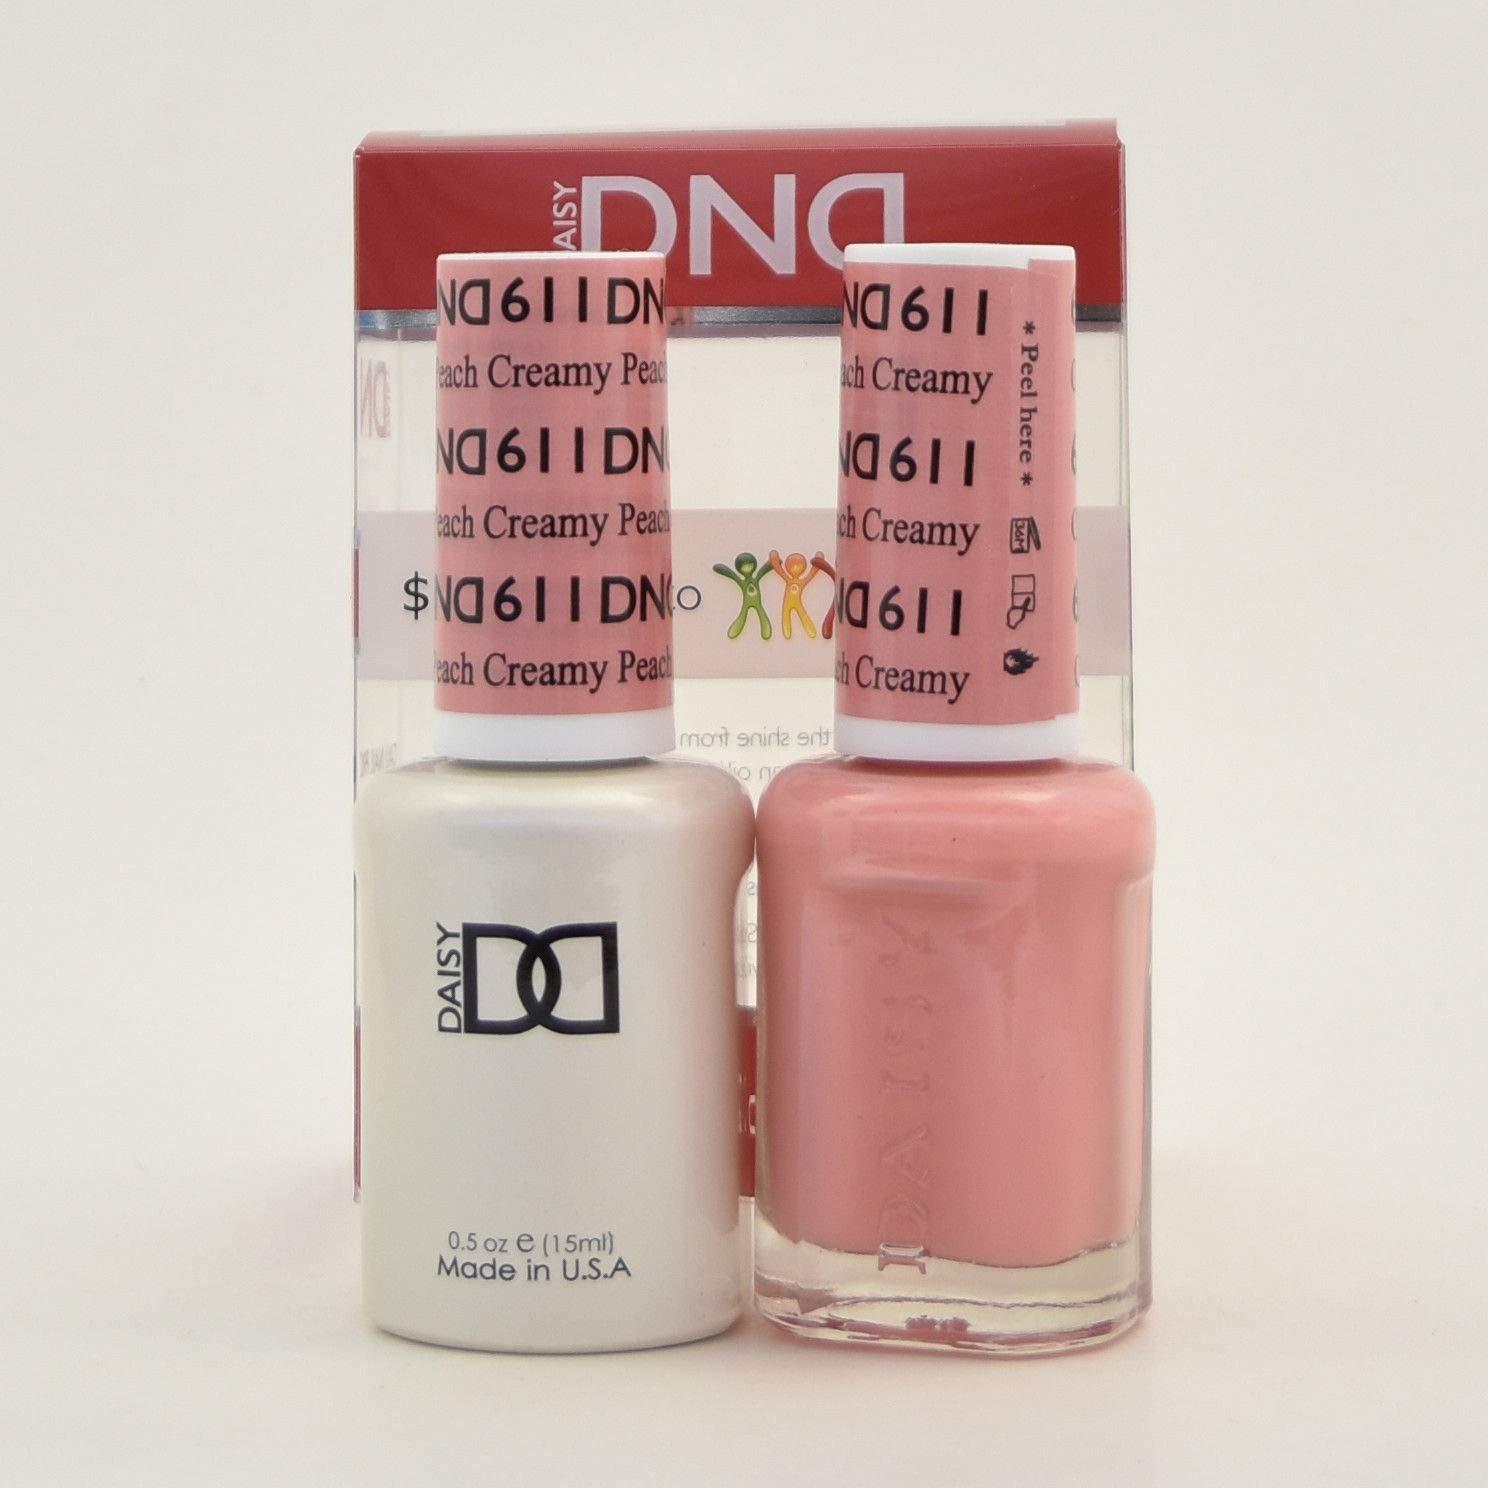 424 - DND Duo Gel-Lemon Juice - VL London Nails Supply